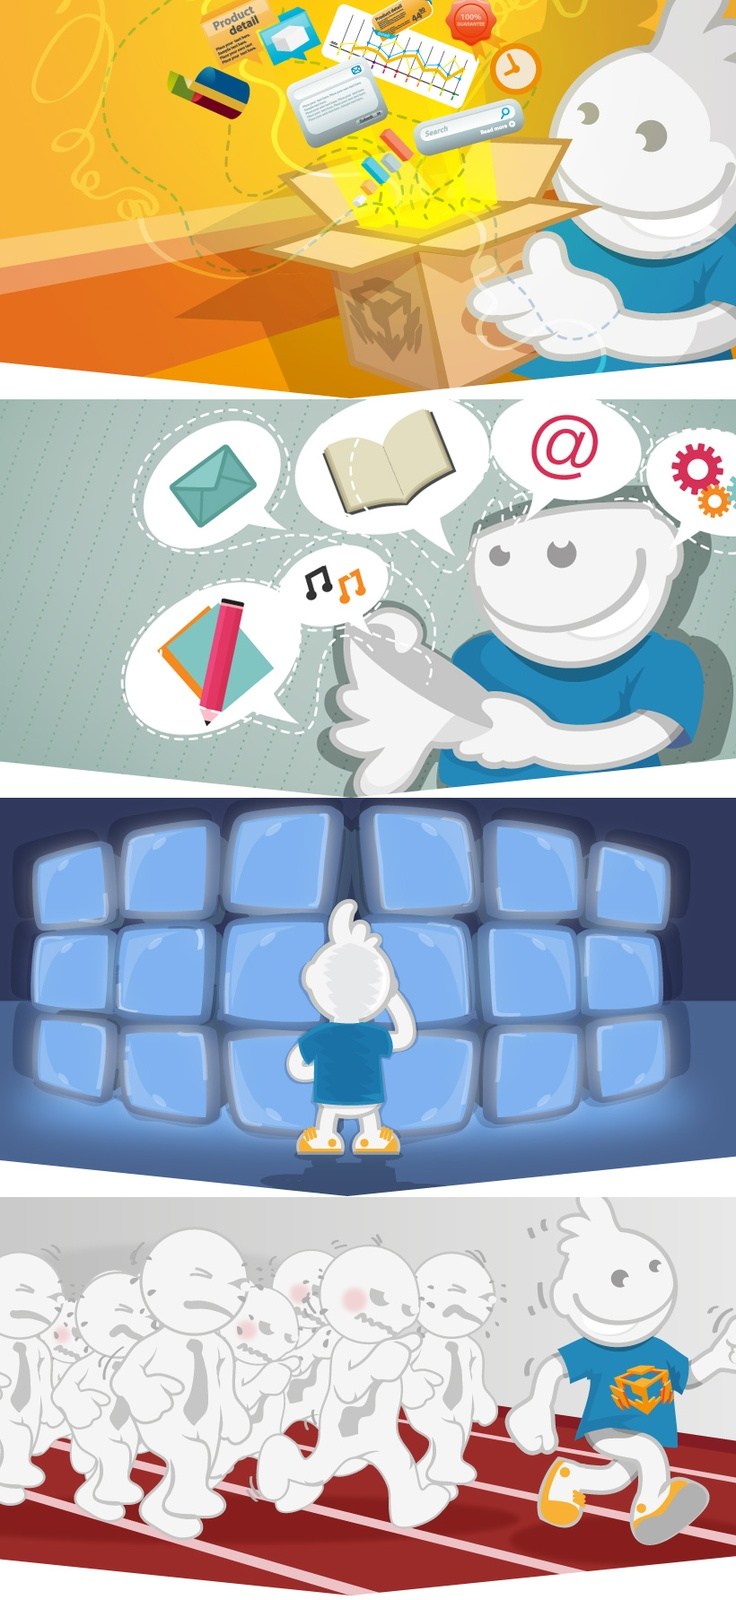 Illustrations by Polish web design studio Merixstudio.com